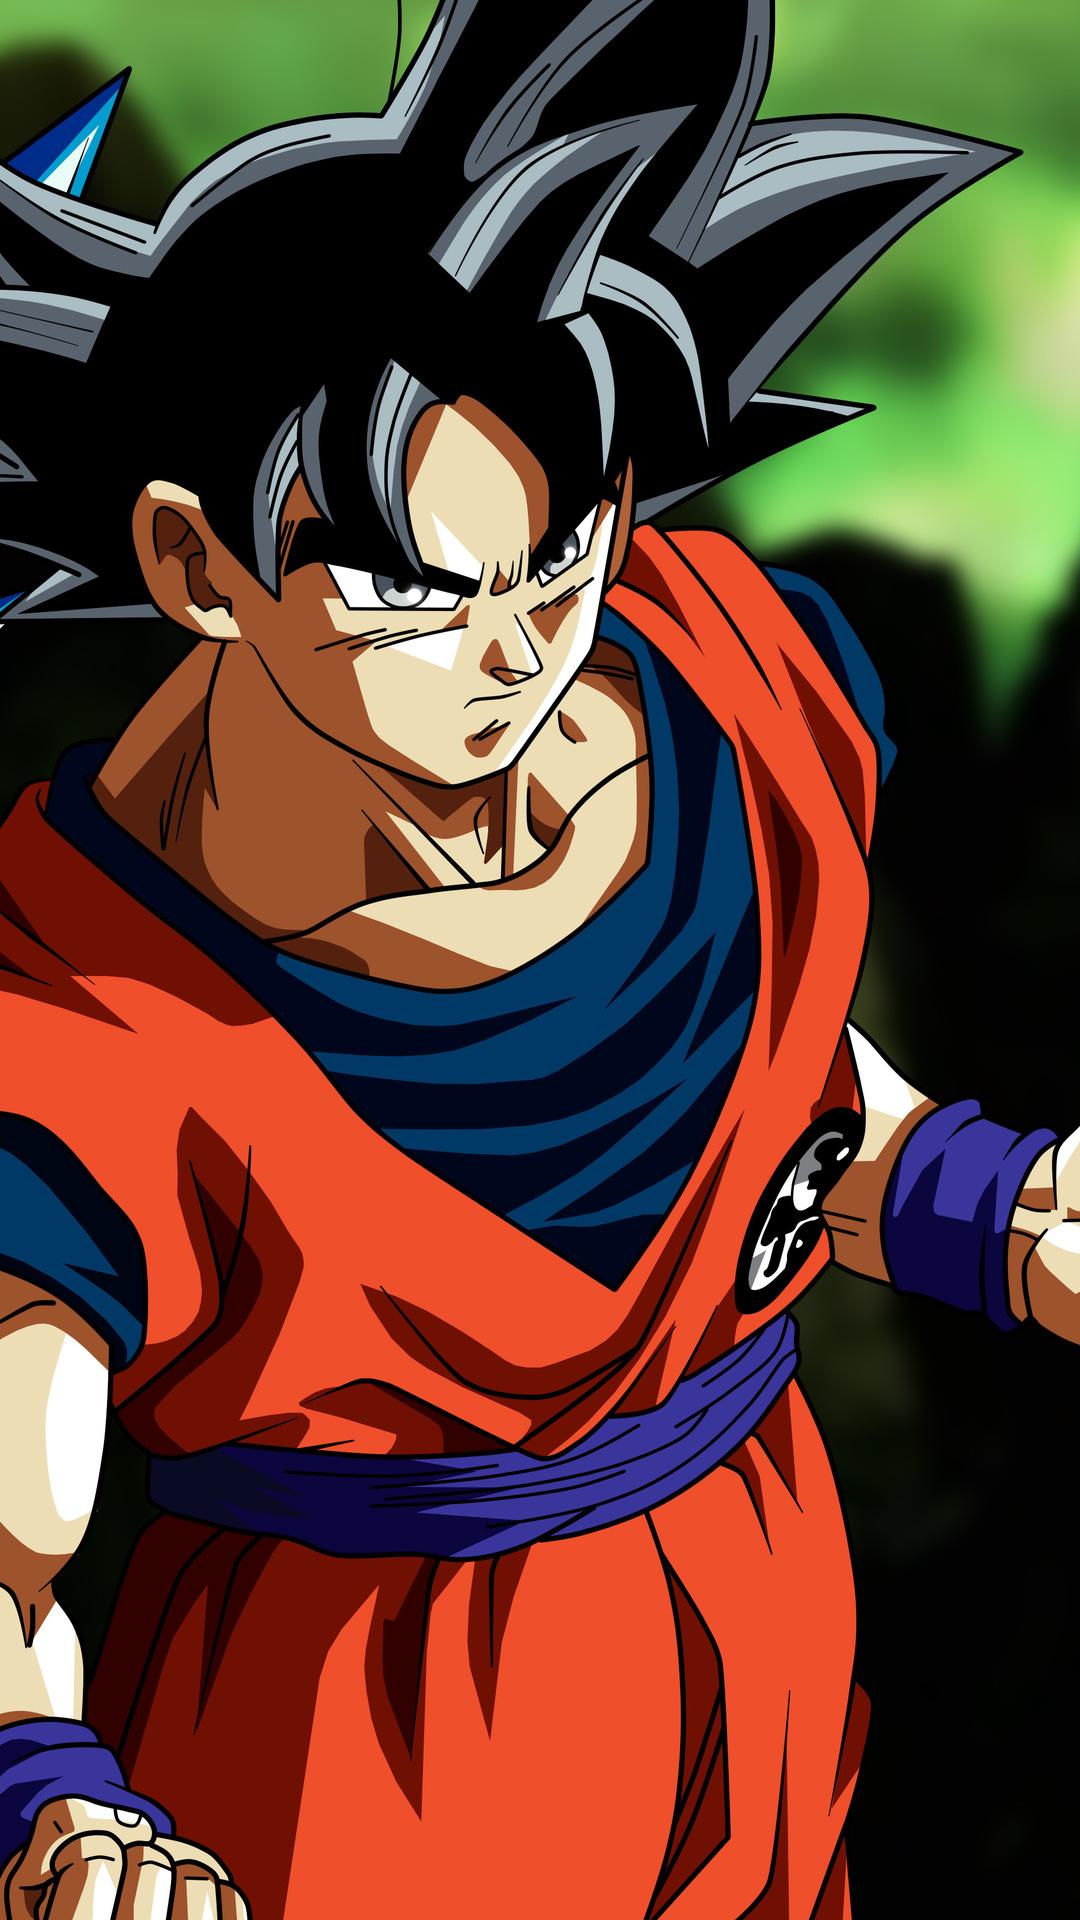 1080x1920 Son Goku Vegeta In Dragon Ball Super 5k Iphone 7